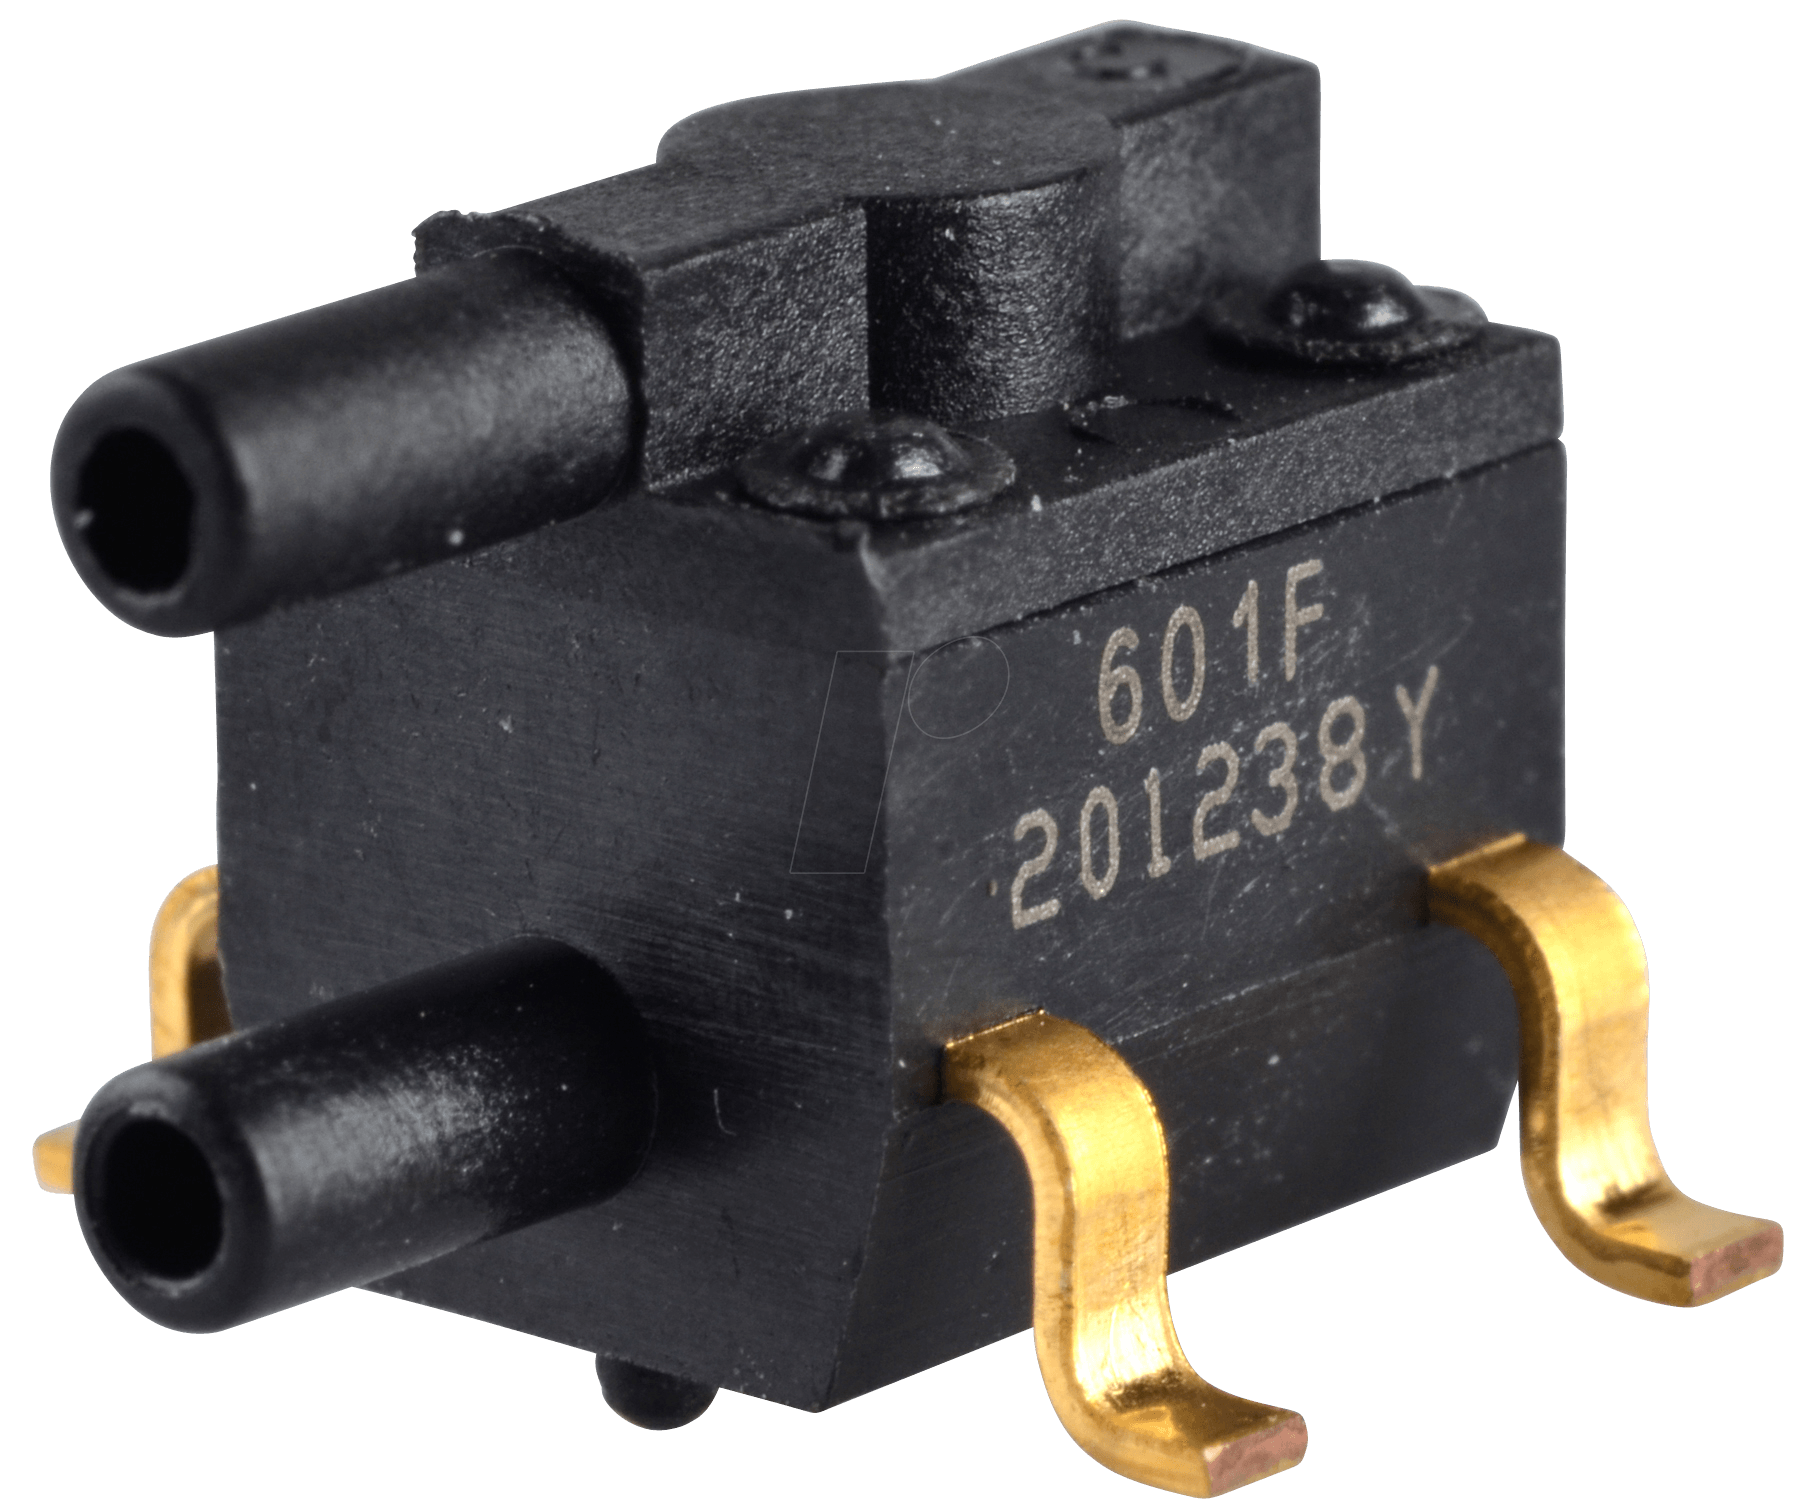 26 PC01 SMT - Differenzdrucksensor, SMD, relativ, ± 1 psi